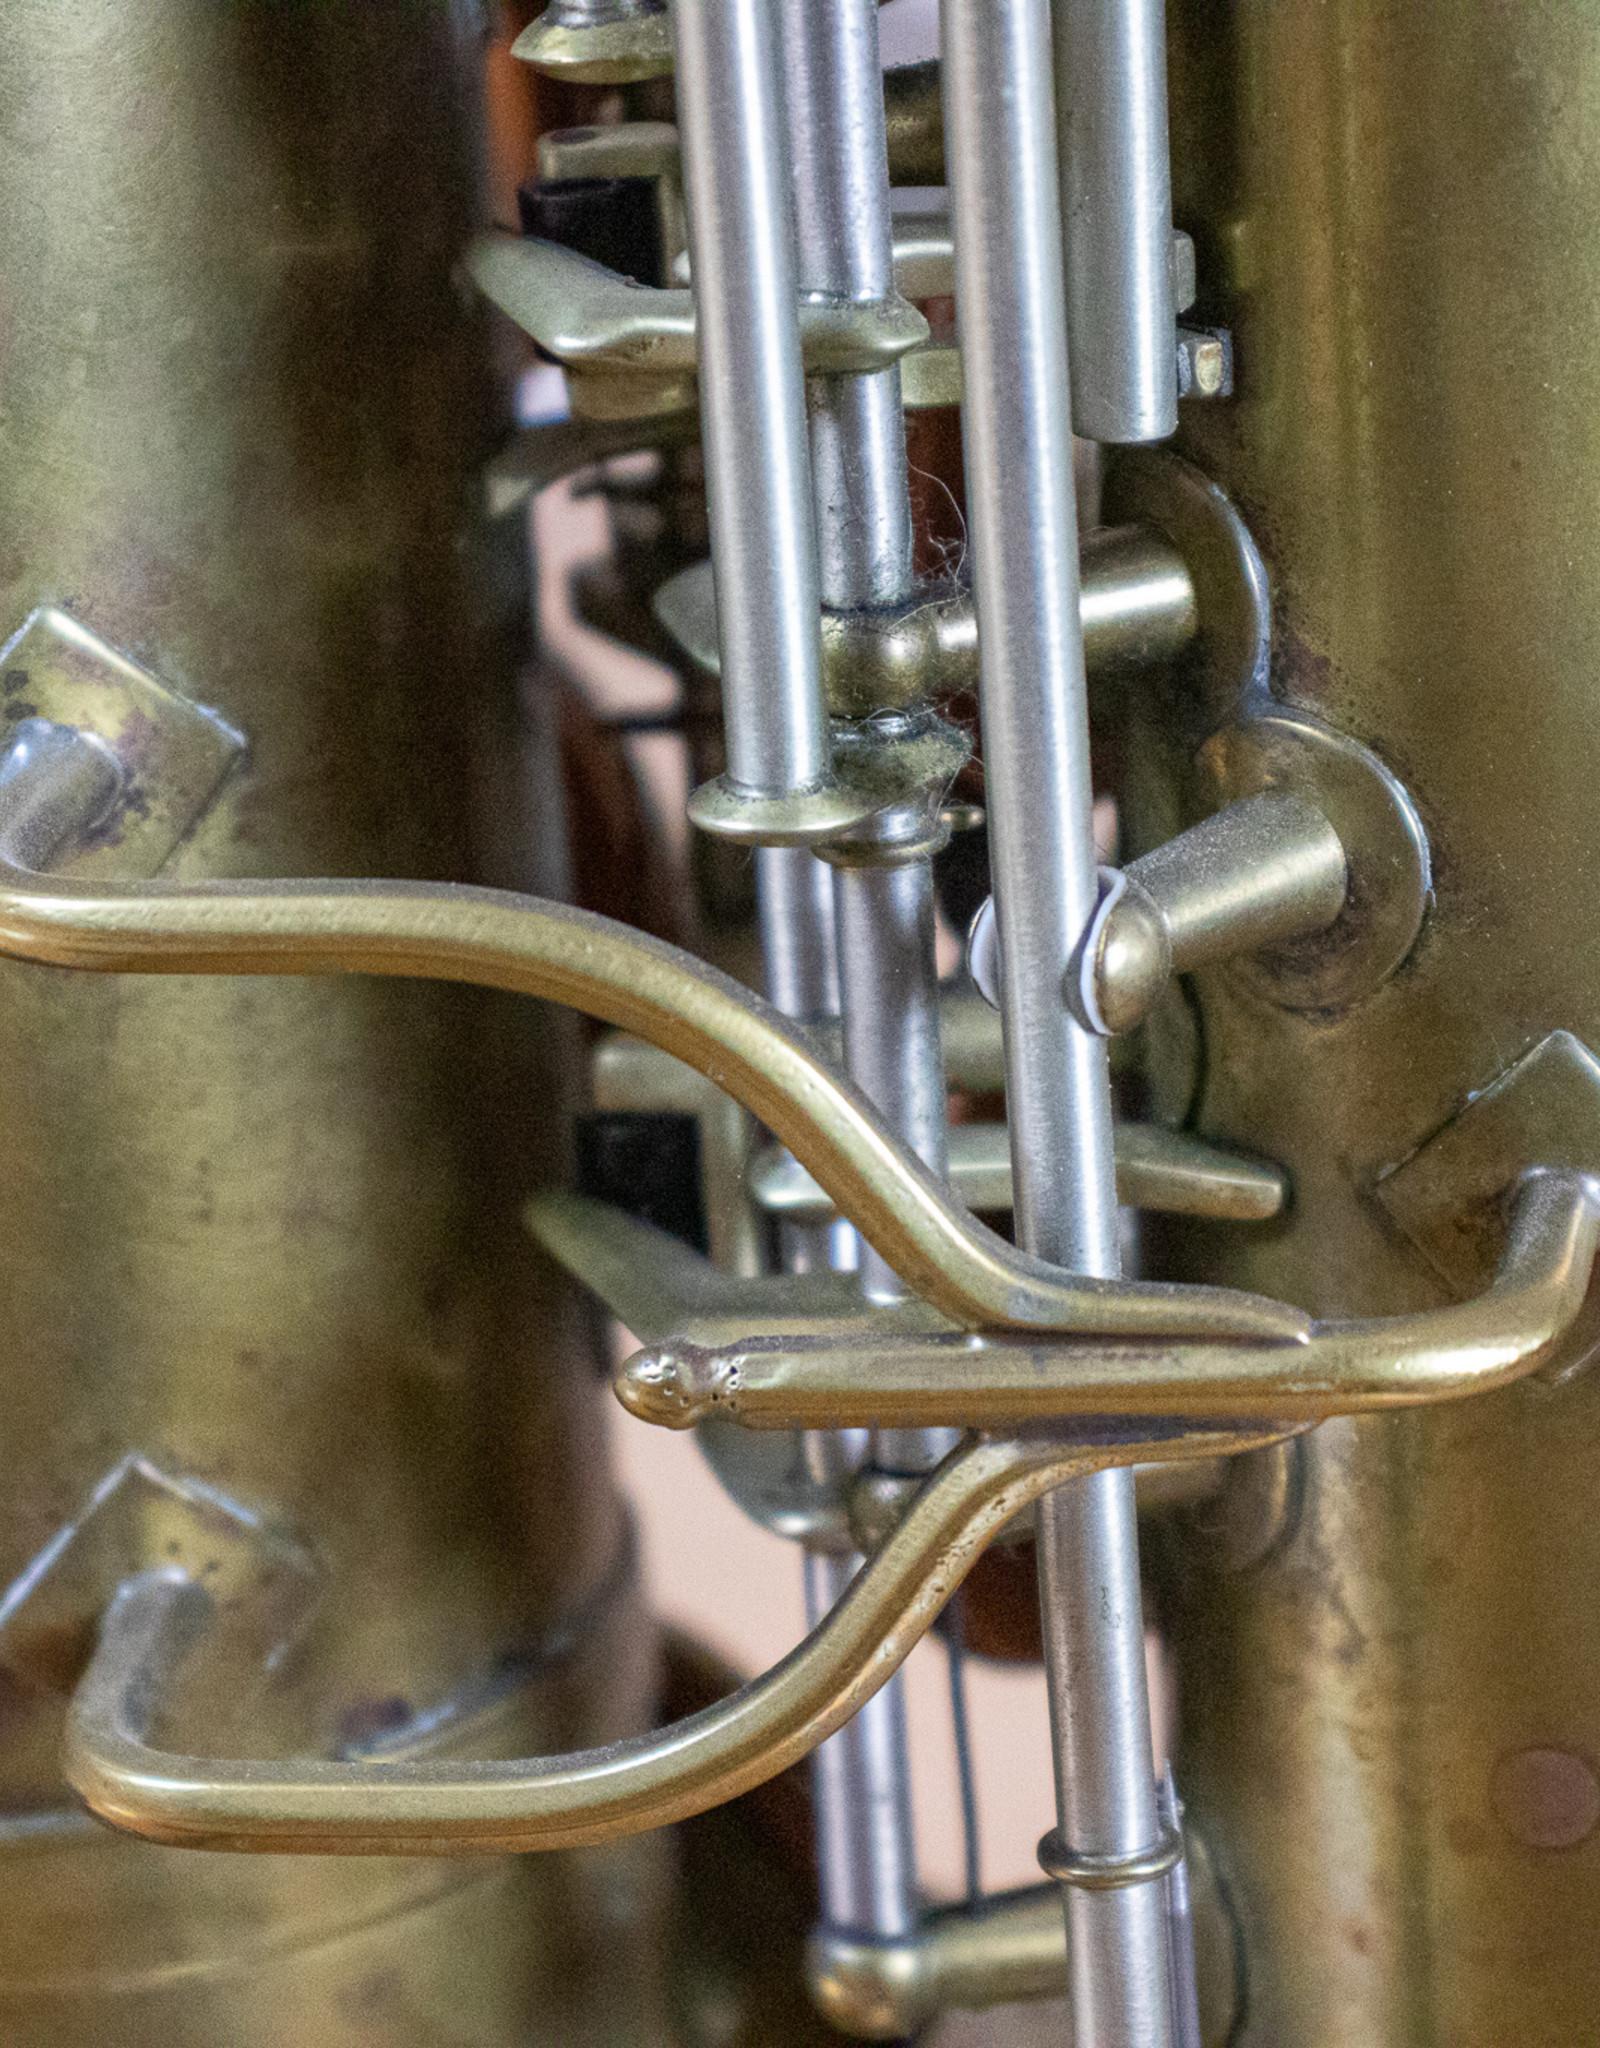 King 1939 King Zephyr series I Alto Saxophone